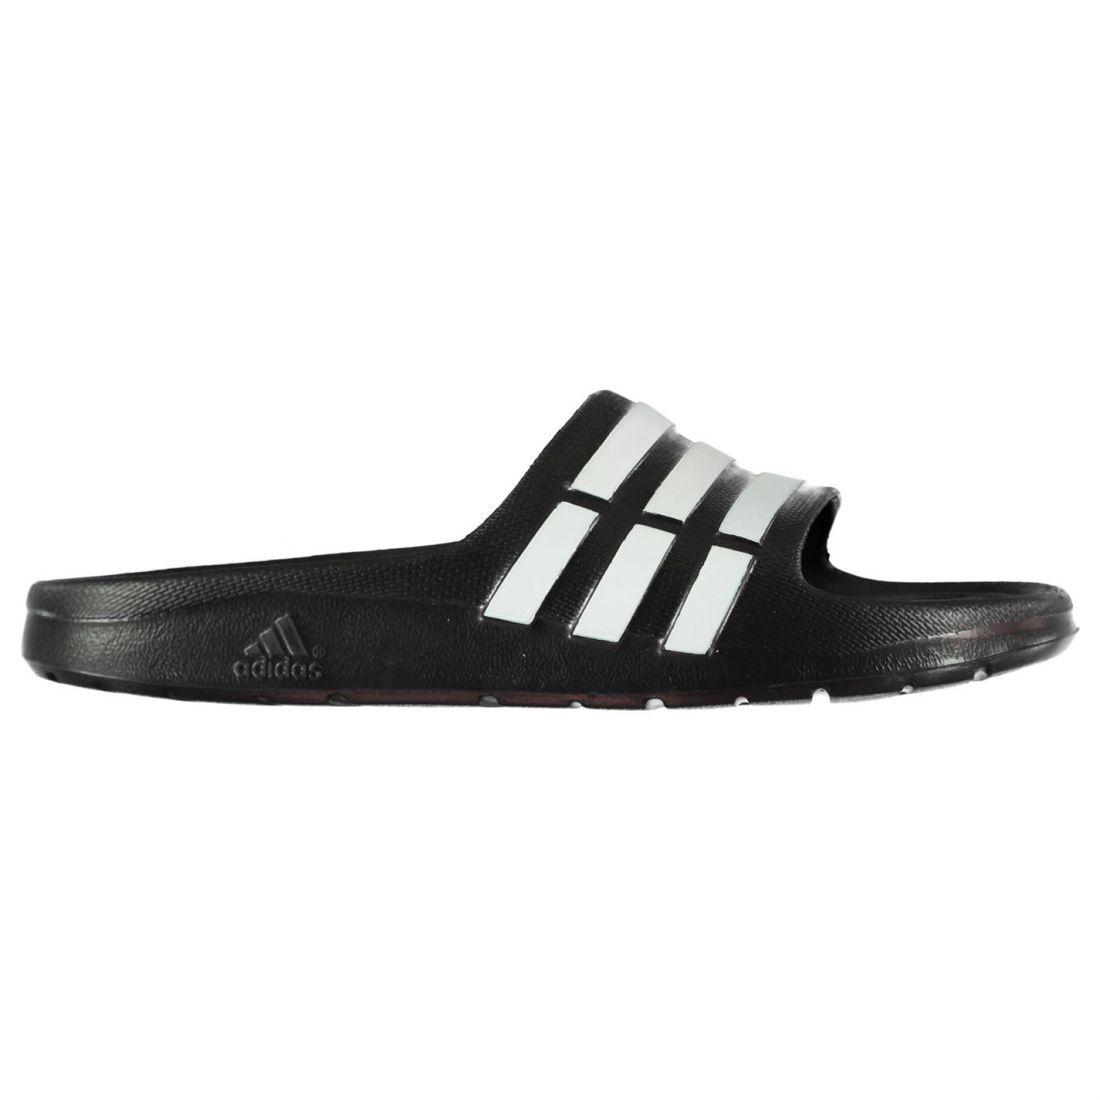 best website 98028 34bd9 adidas Kids Boys Duramo Slide Pool Shoes Slip On Forefoot Strap Lightweight